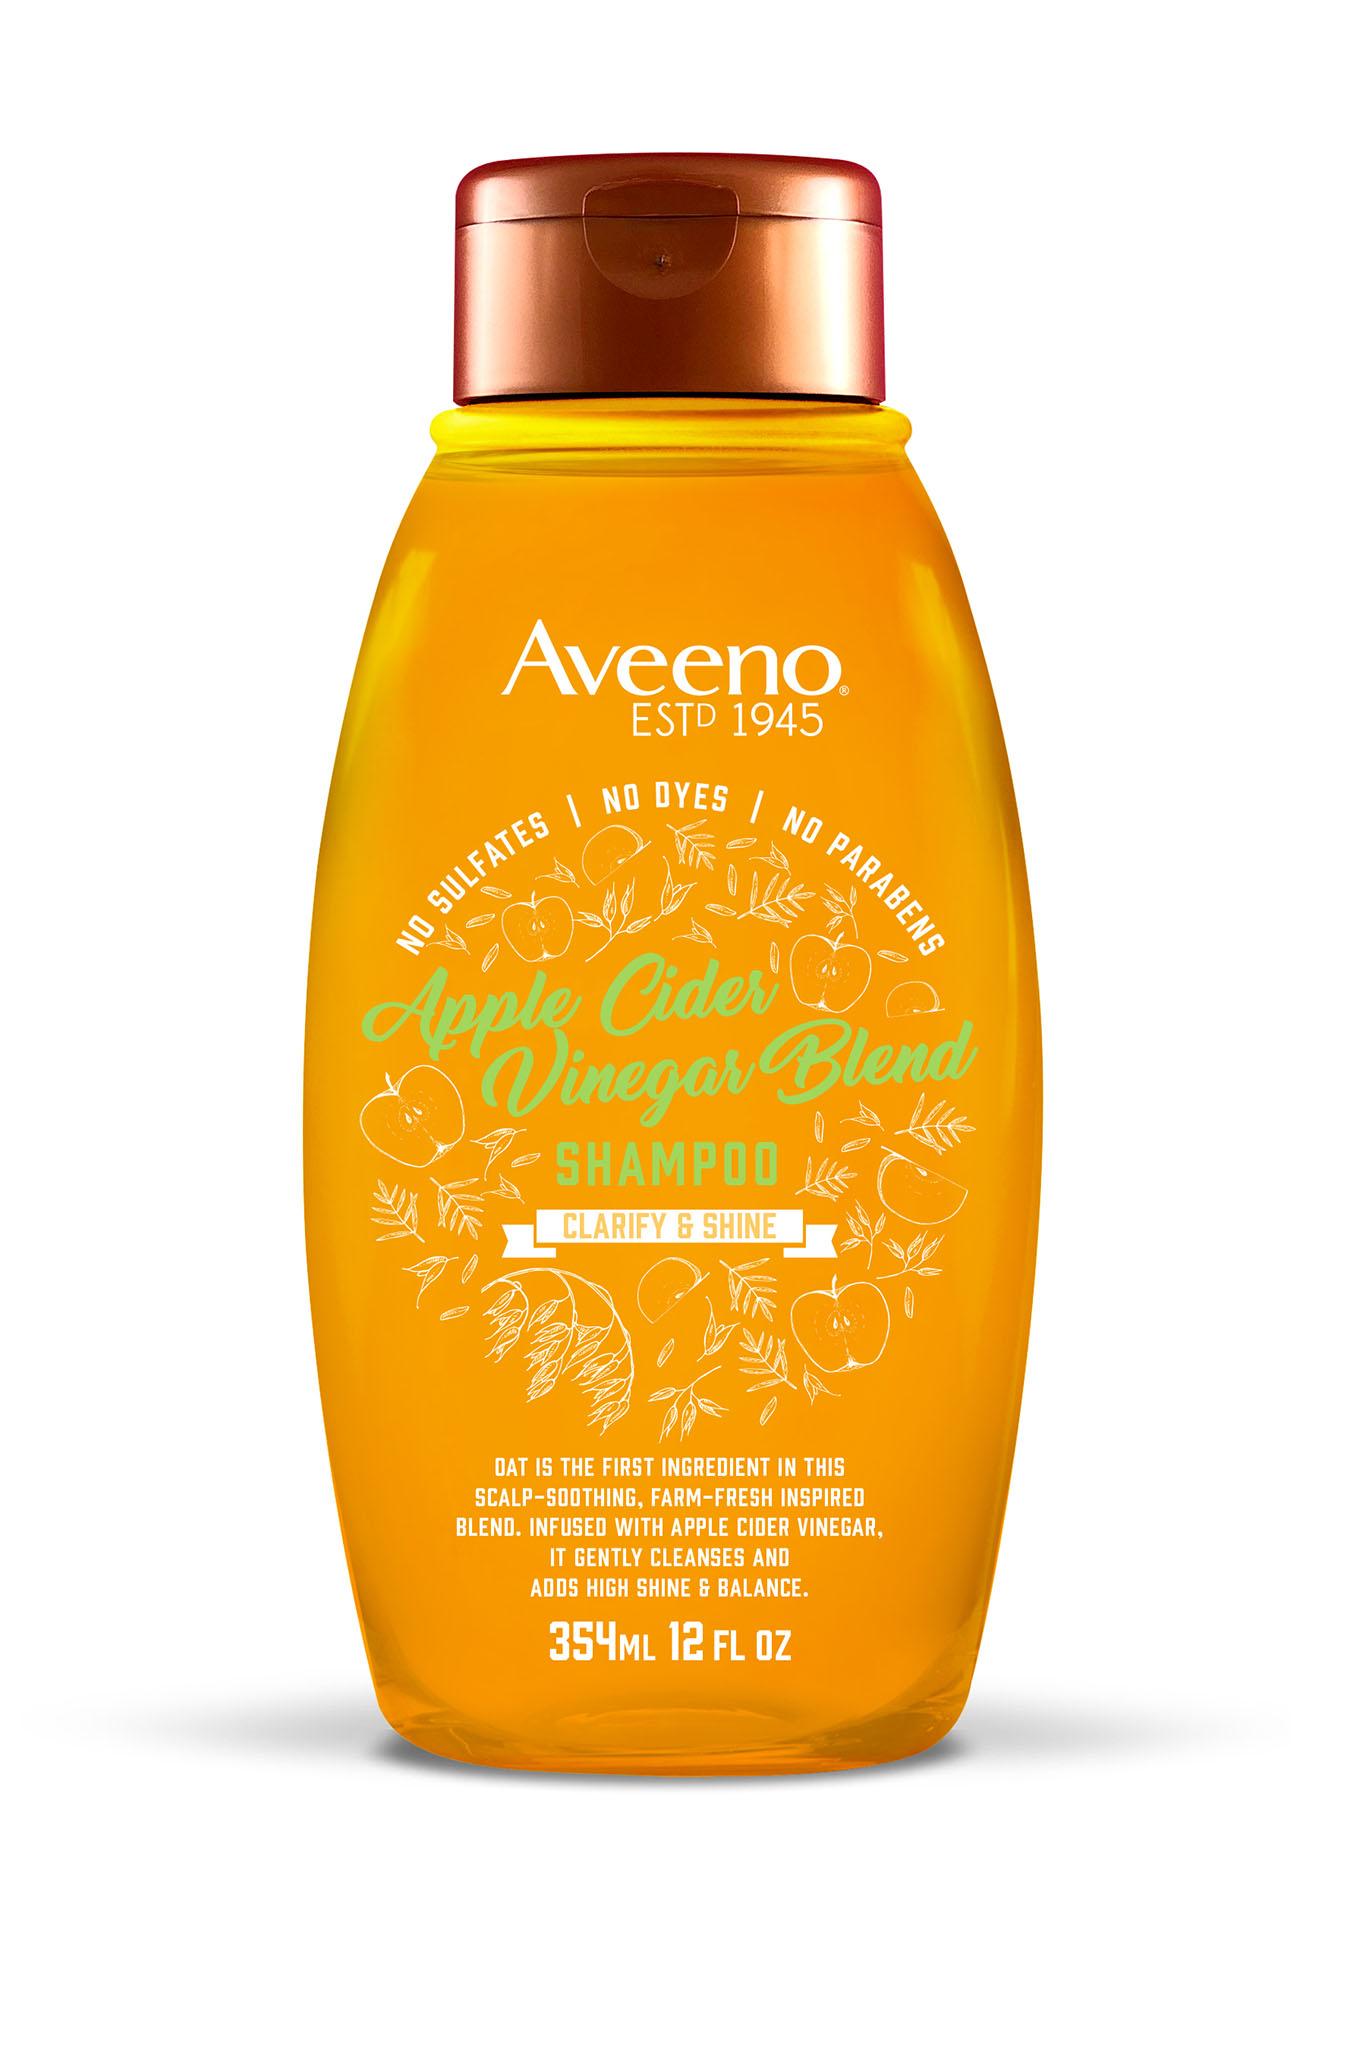 Aveeno Hair Collection